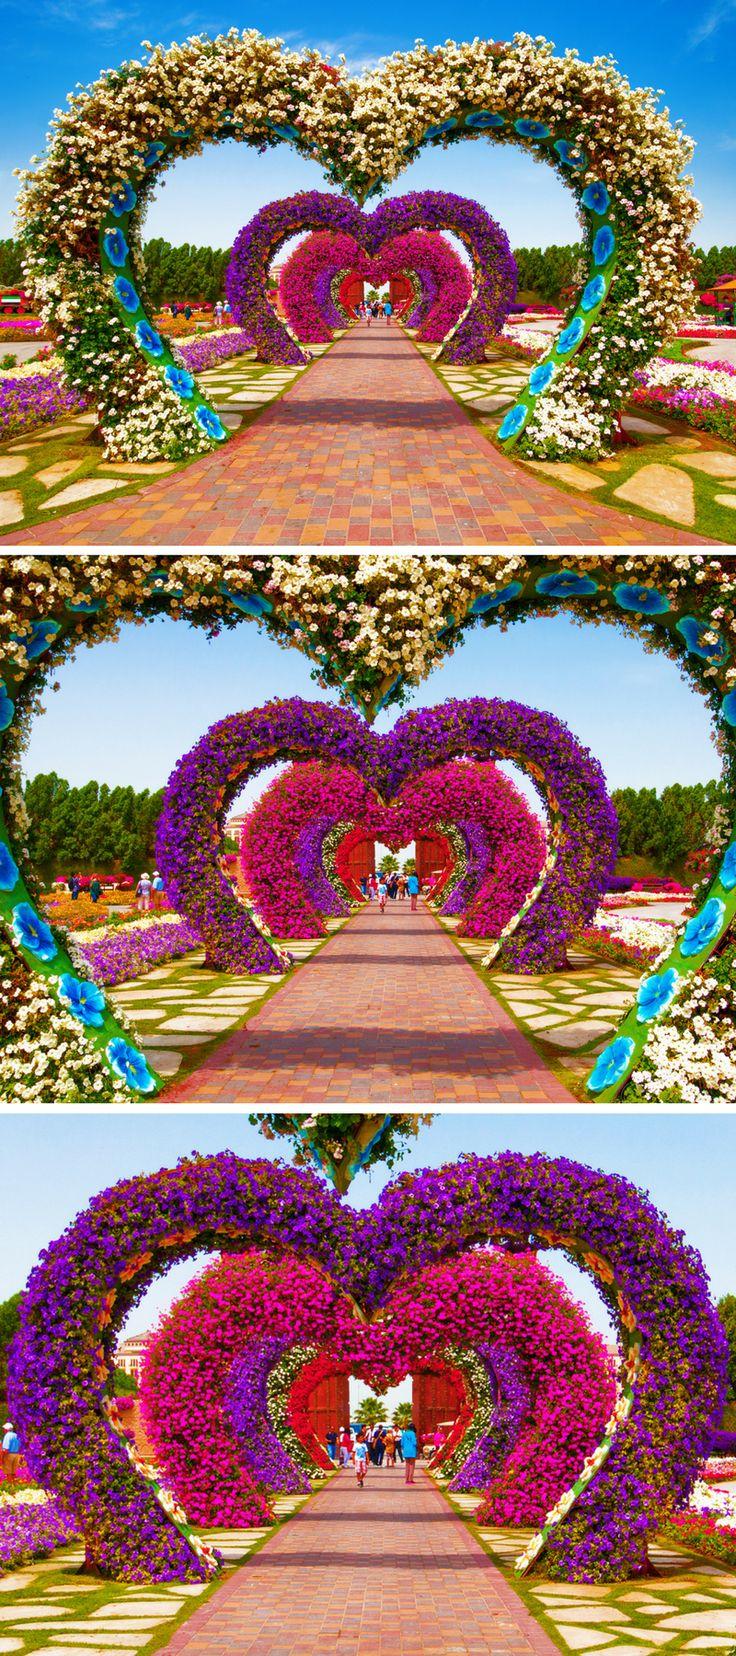 Dubai Miracle Garden! Top 10 Things to do in Dubai!